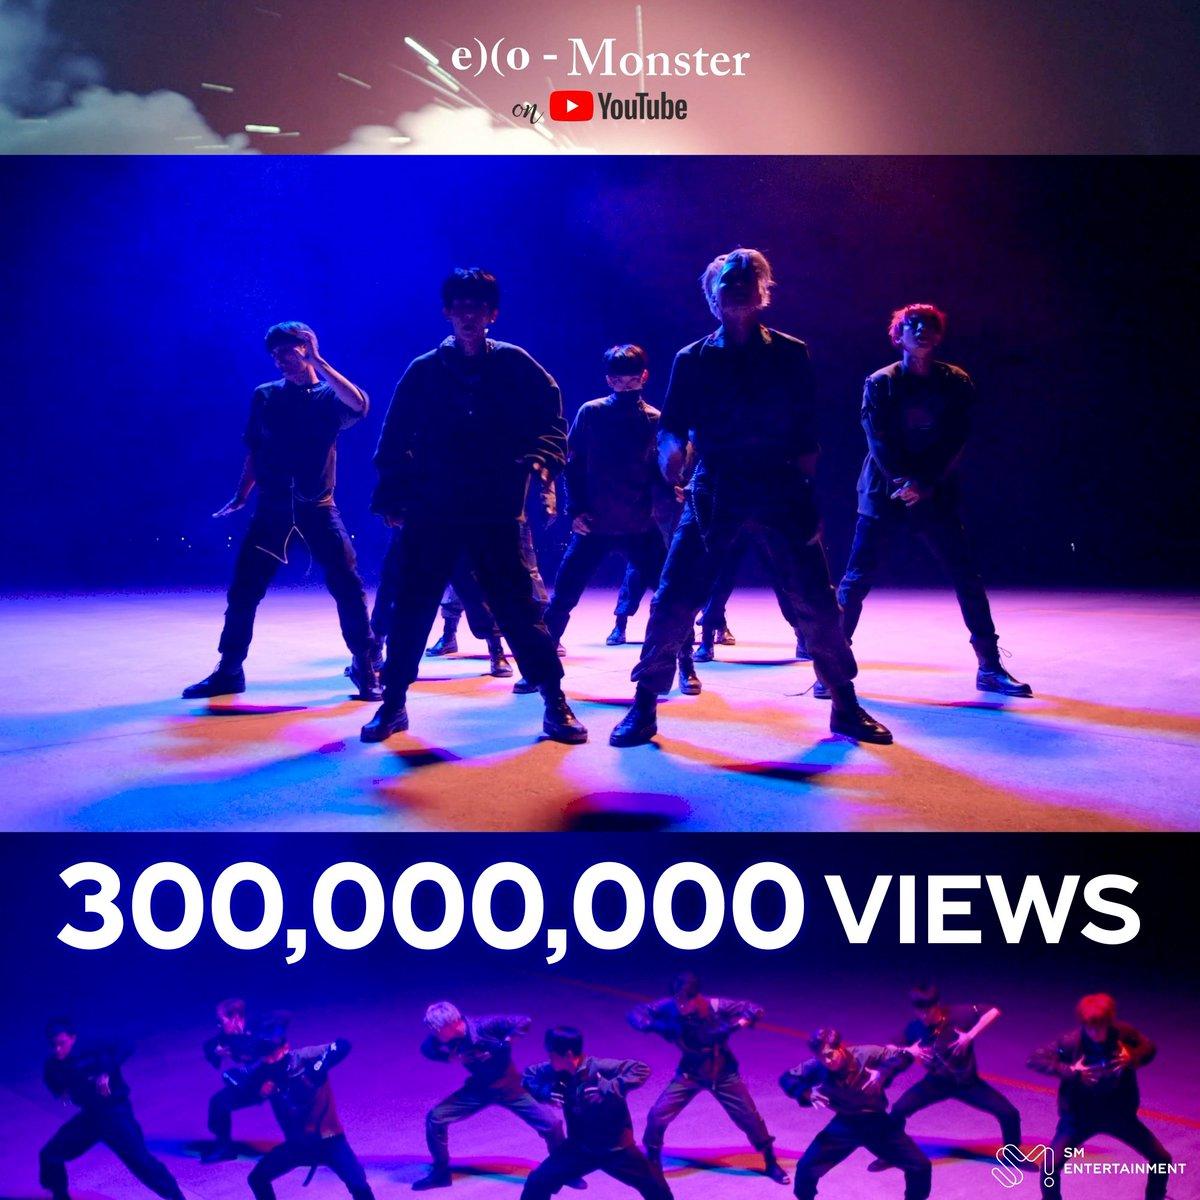 EXO의 'Monster' 뮤직비디오가 유튜브 조회수 3억뷰를 돌파했습니다! 👏 EXO's 'Monster' MV has surpassed 300 Million views on YouTube! 👏 🎬 youtu.be/KSH-FVVtTf0 #어디에도_없을_완벽한_EXO #엑소 #EXO #weareoneEXO #몬스터 #Monster